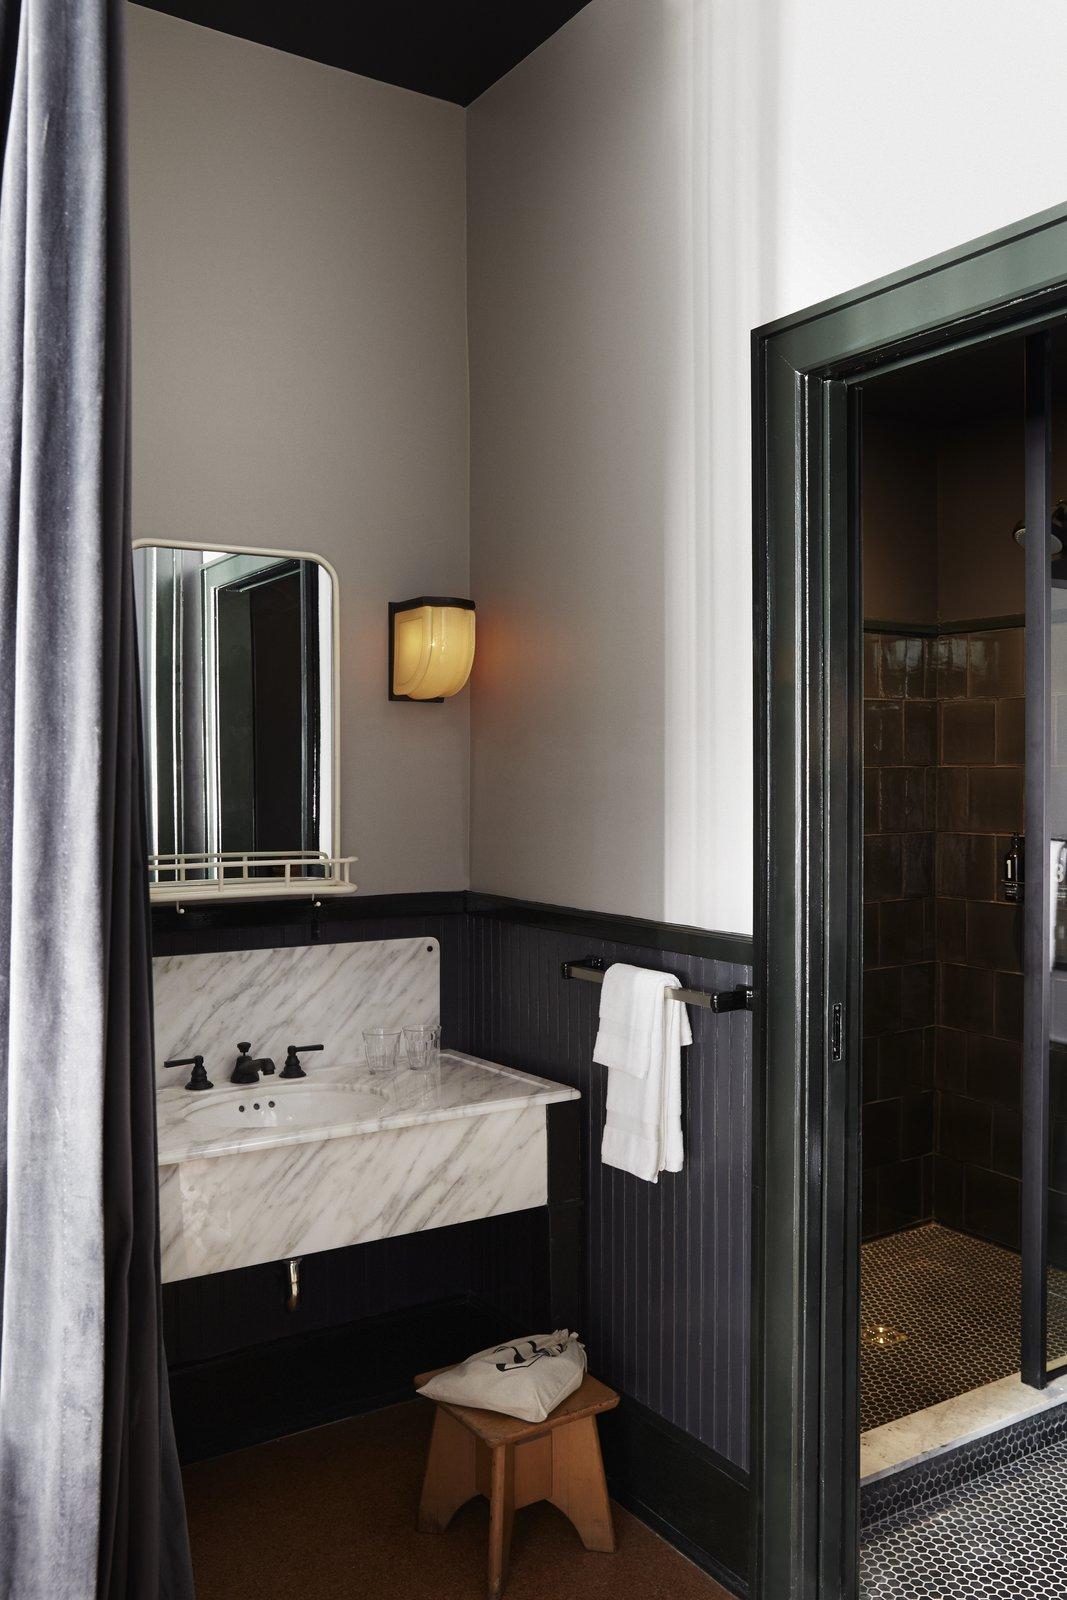 #acehotel #neworleans #louisiana #hospitality #classic #modern  Photo courtesy of Ace Hotel, New Orleans Ace Hotel, New Orleans by Ace Hotel